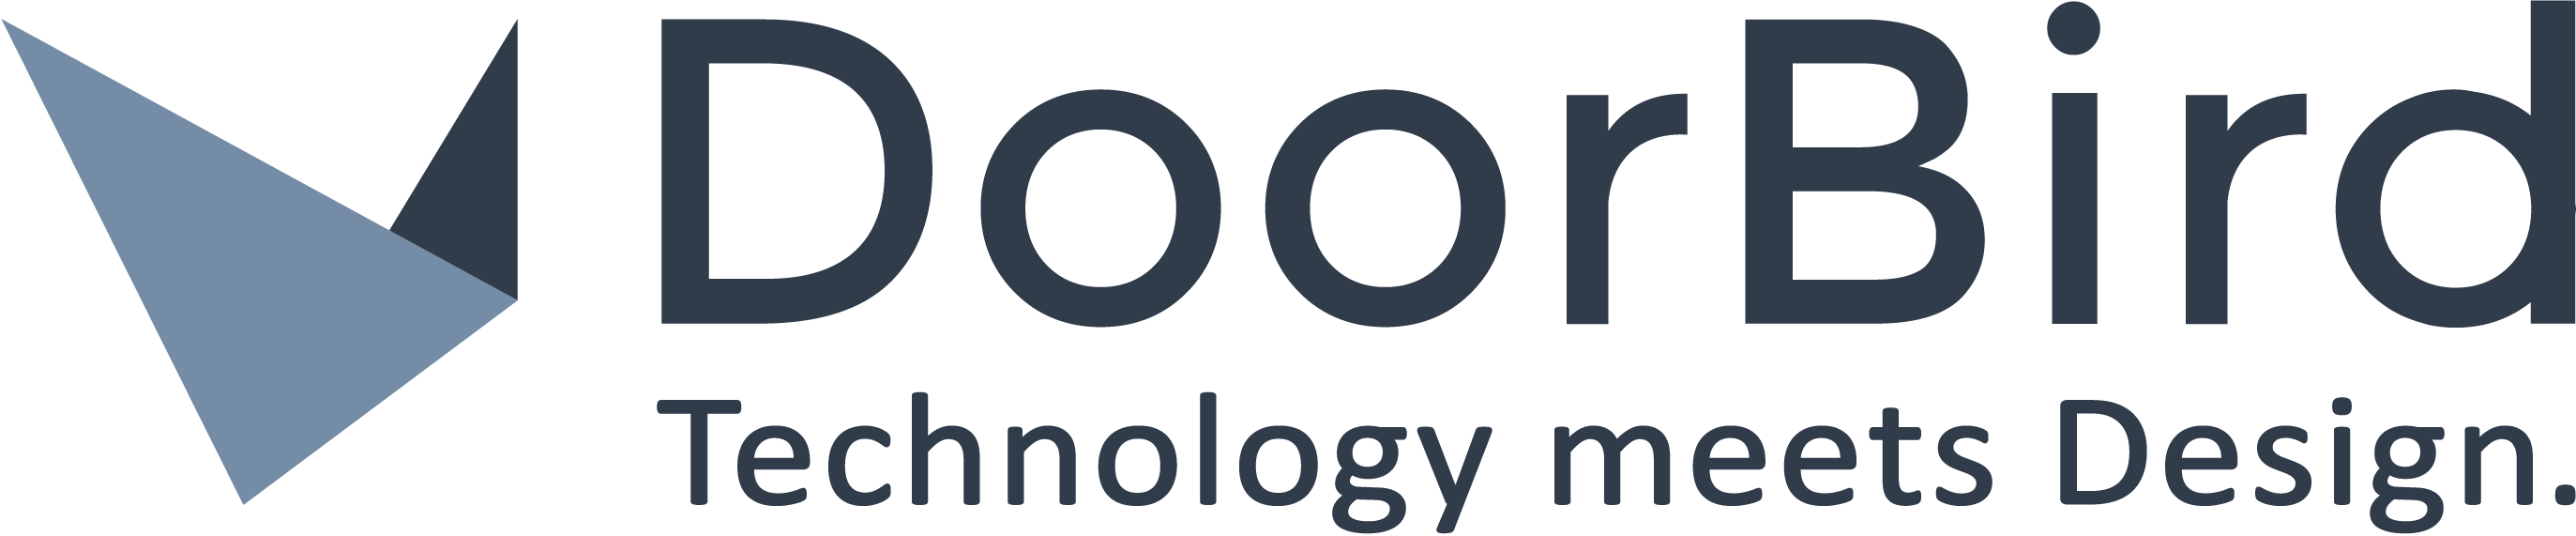 doorbird_Logo_RGB_tmd